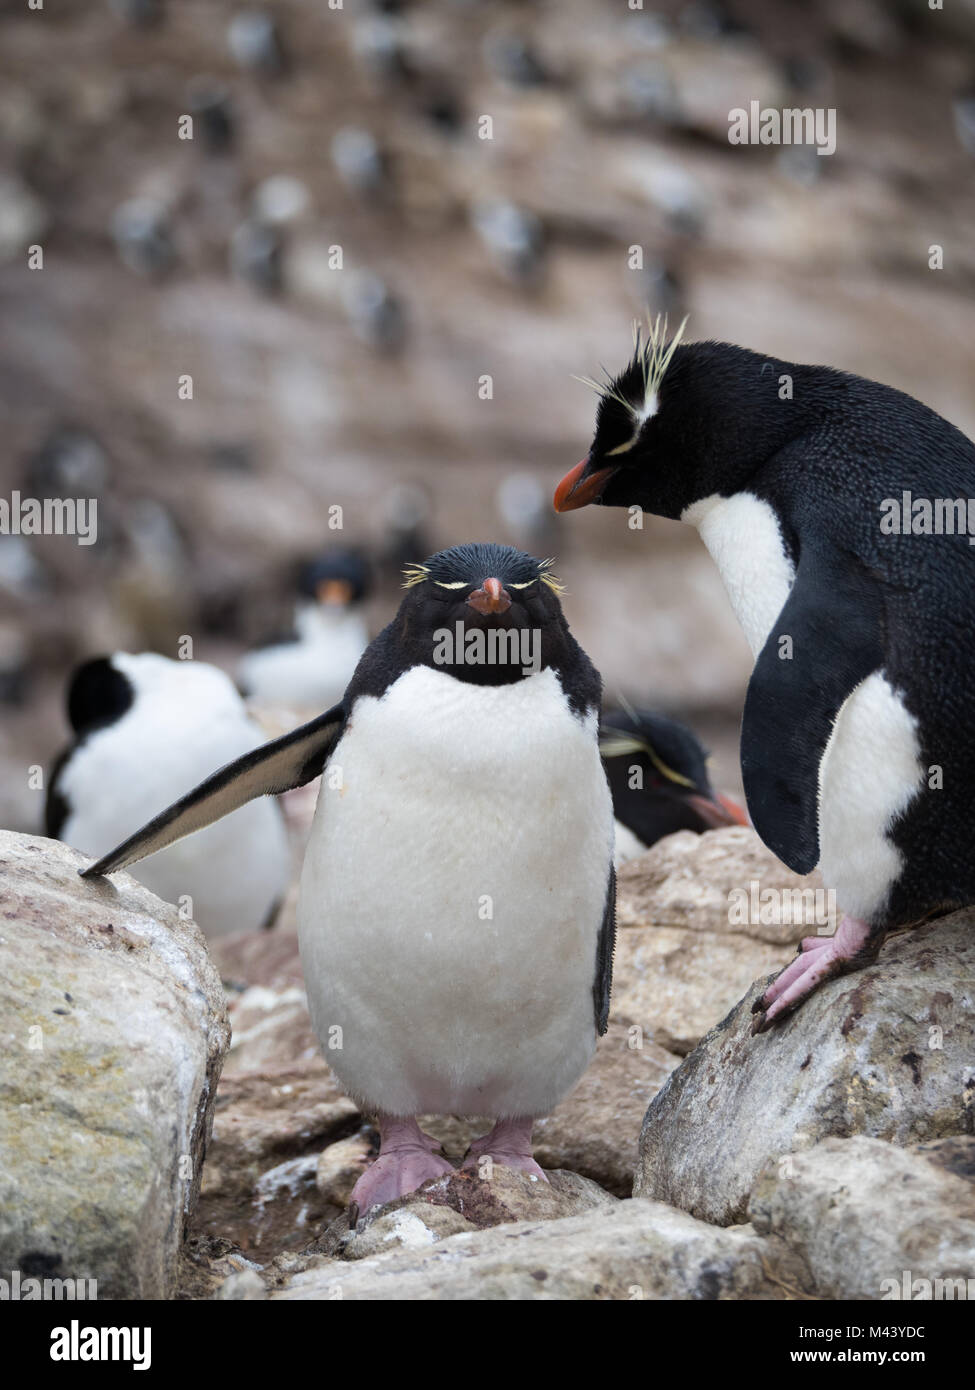 A rockhopper penguin climbing up rocks past a standing rockhopper penguin with pink webbed feet. - Stock Image